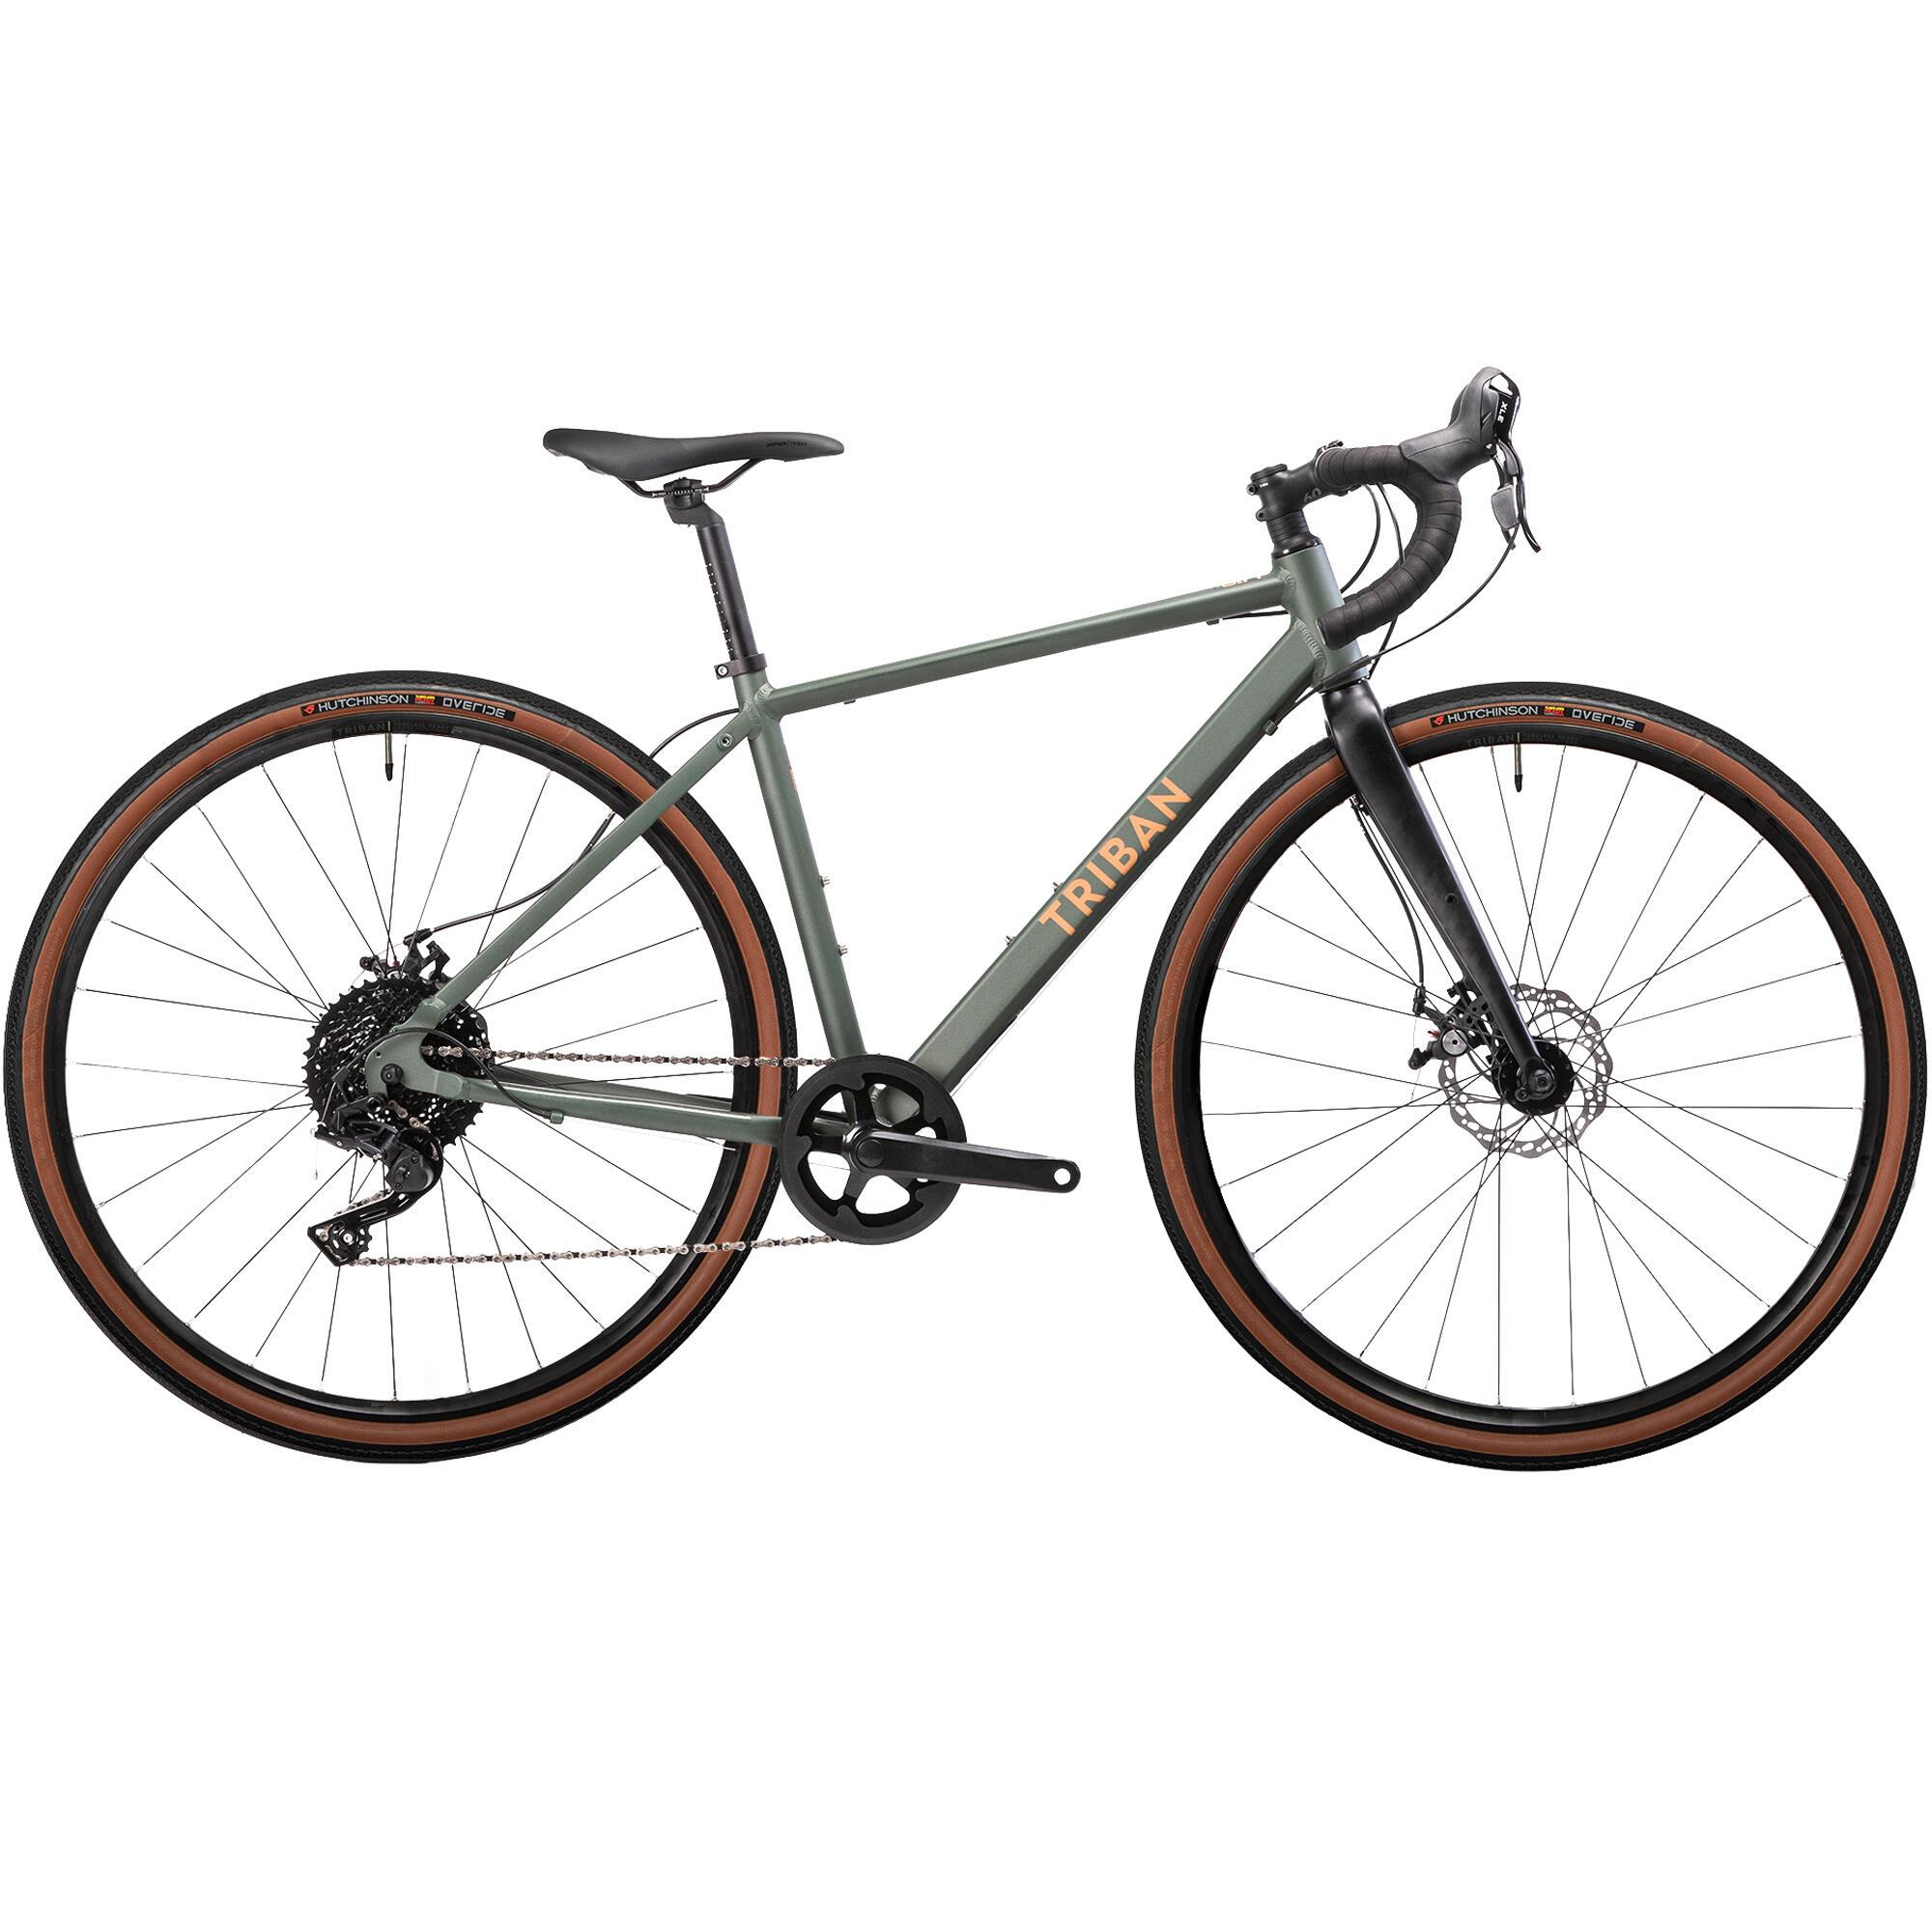 Bicicletă GRAVEL 120 Damă la Reducere poza